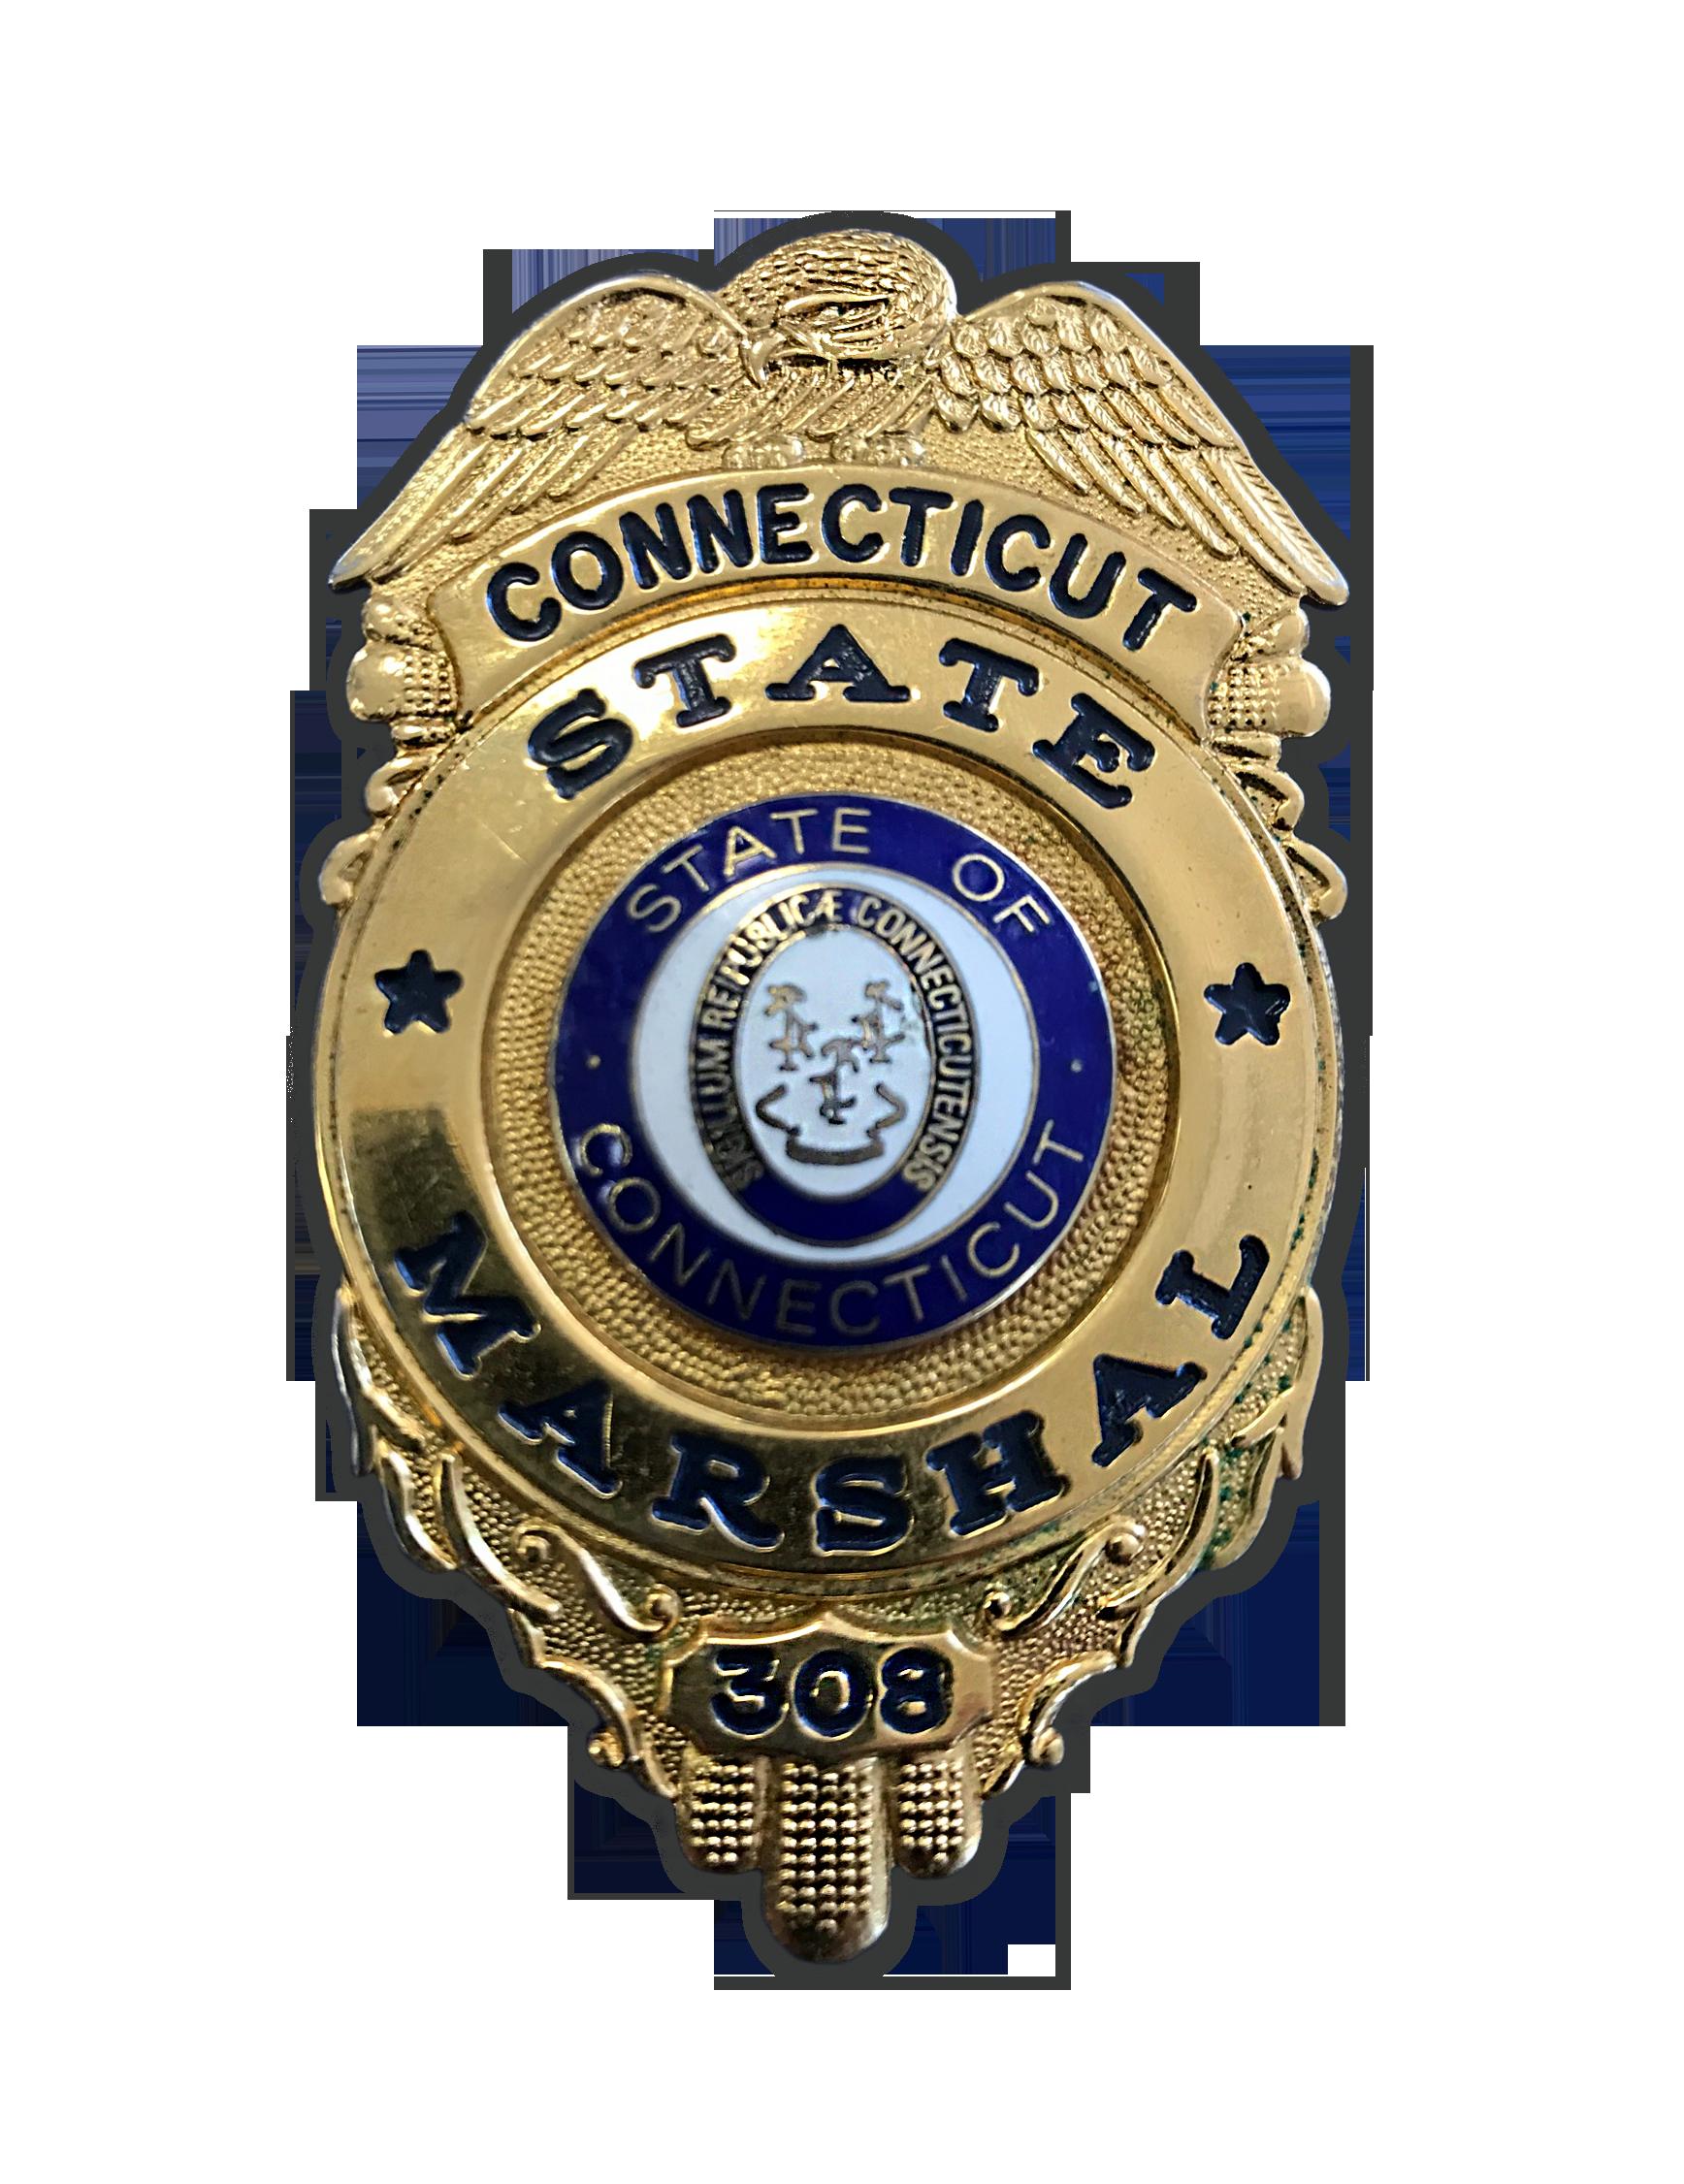 Frank P. Sandillo CT Marshal Badge #308.png